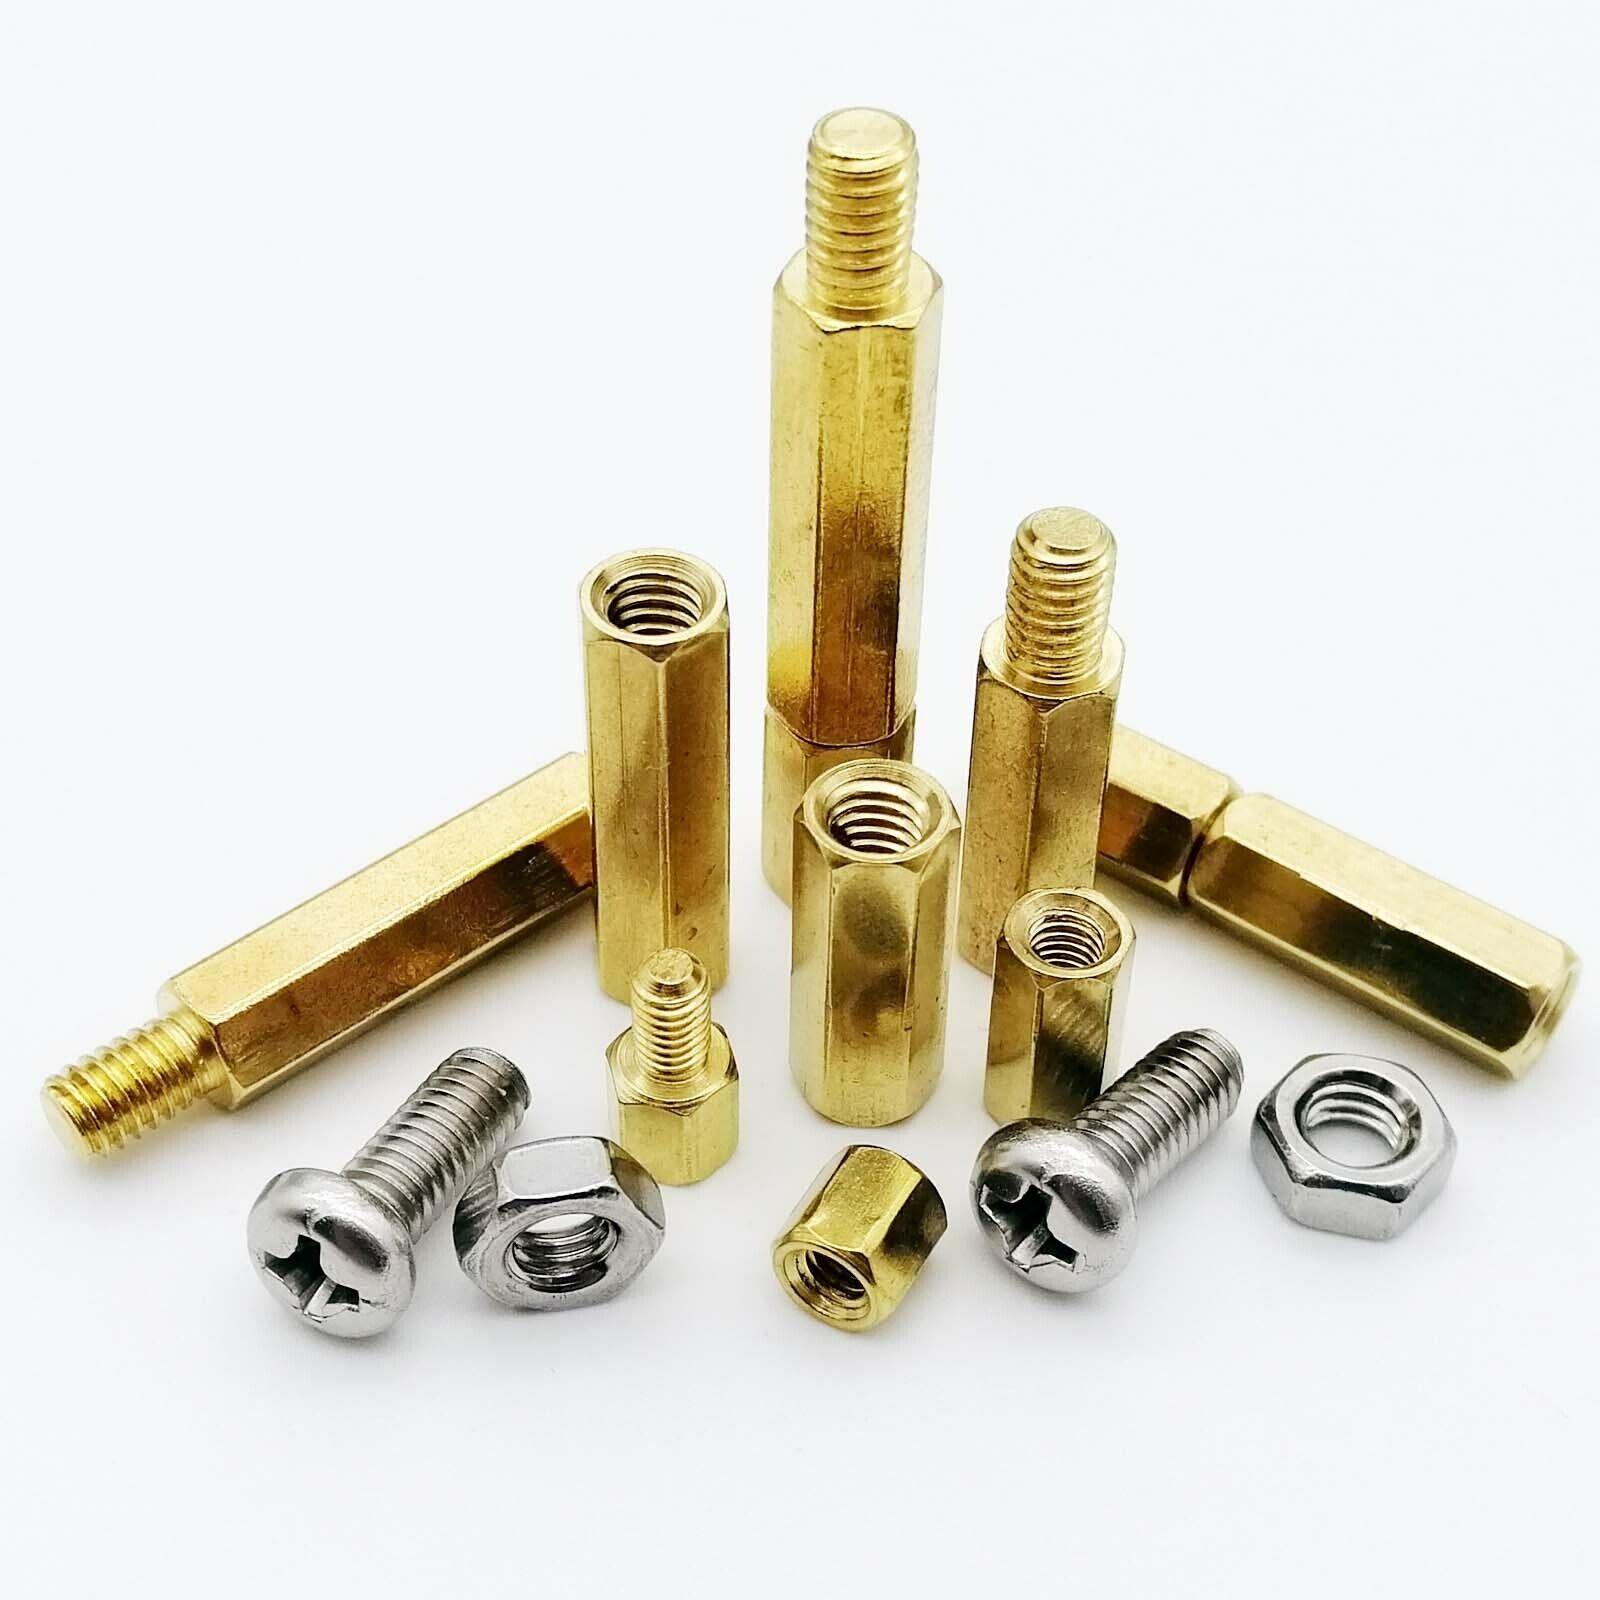 6mm M3 Brass Threaded Hex Male-Female Standoff Spacer Pillar 10pcs 45mm